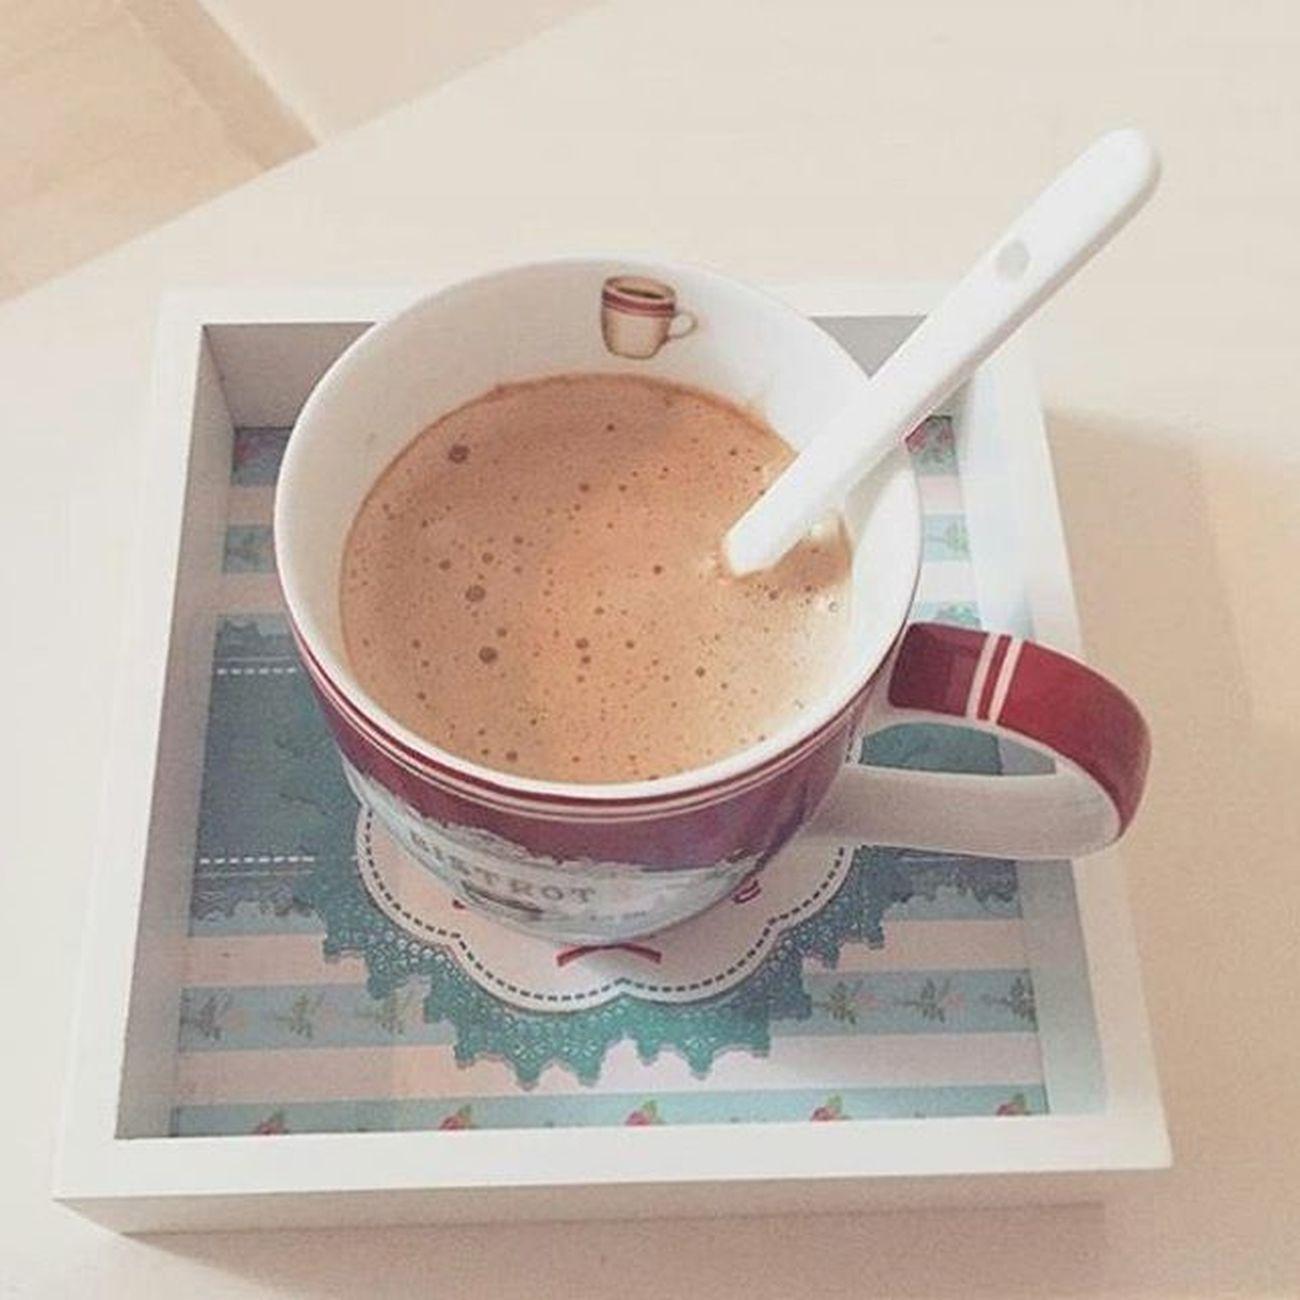 Bonjour Cafe Time Athome  Insta3roussamezyena Insta3roussa 😚 👰 💑 Instalovers Instagood Happppy Love préparation de mariage love